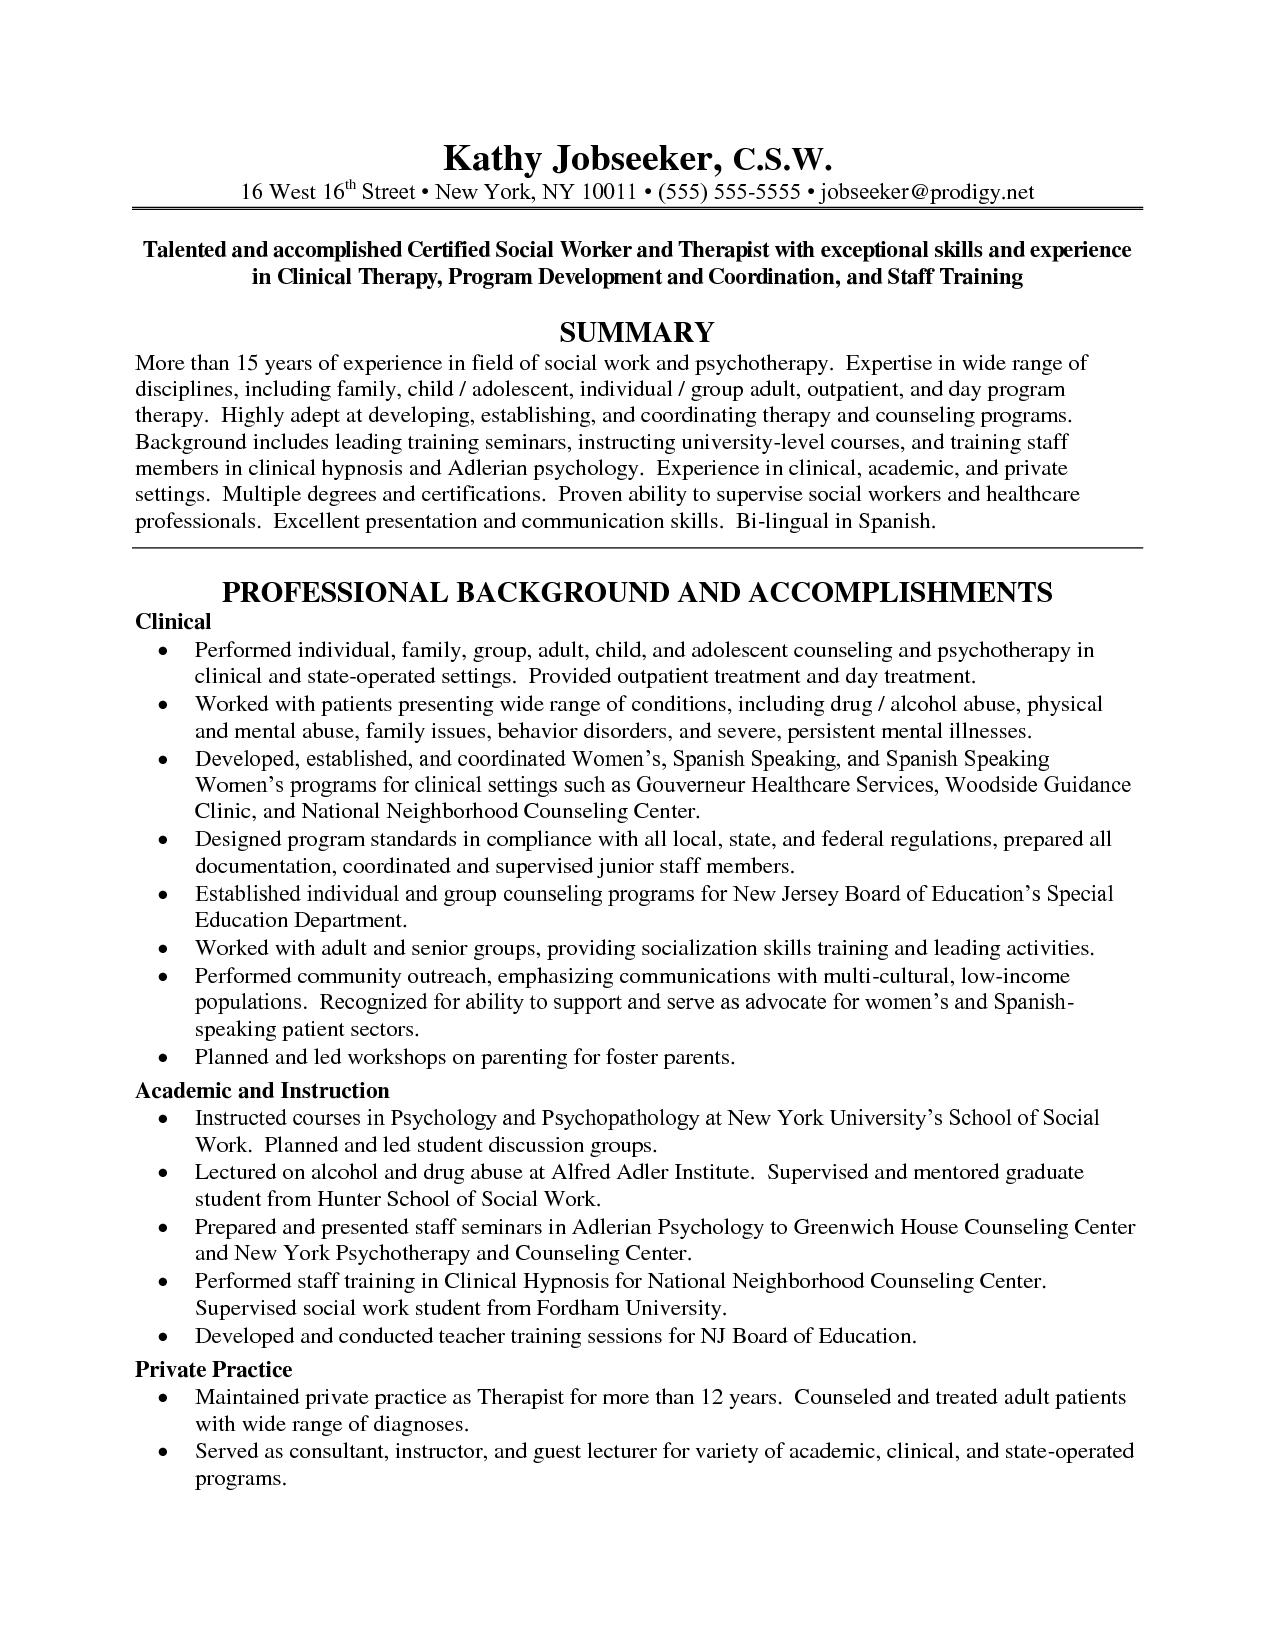 Examples Of Social Work Resumes - Resume Sample